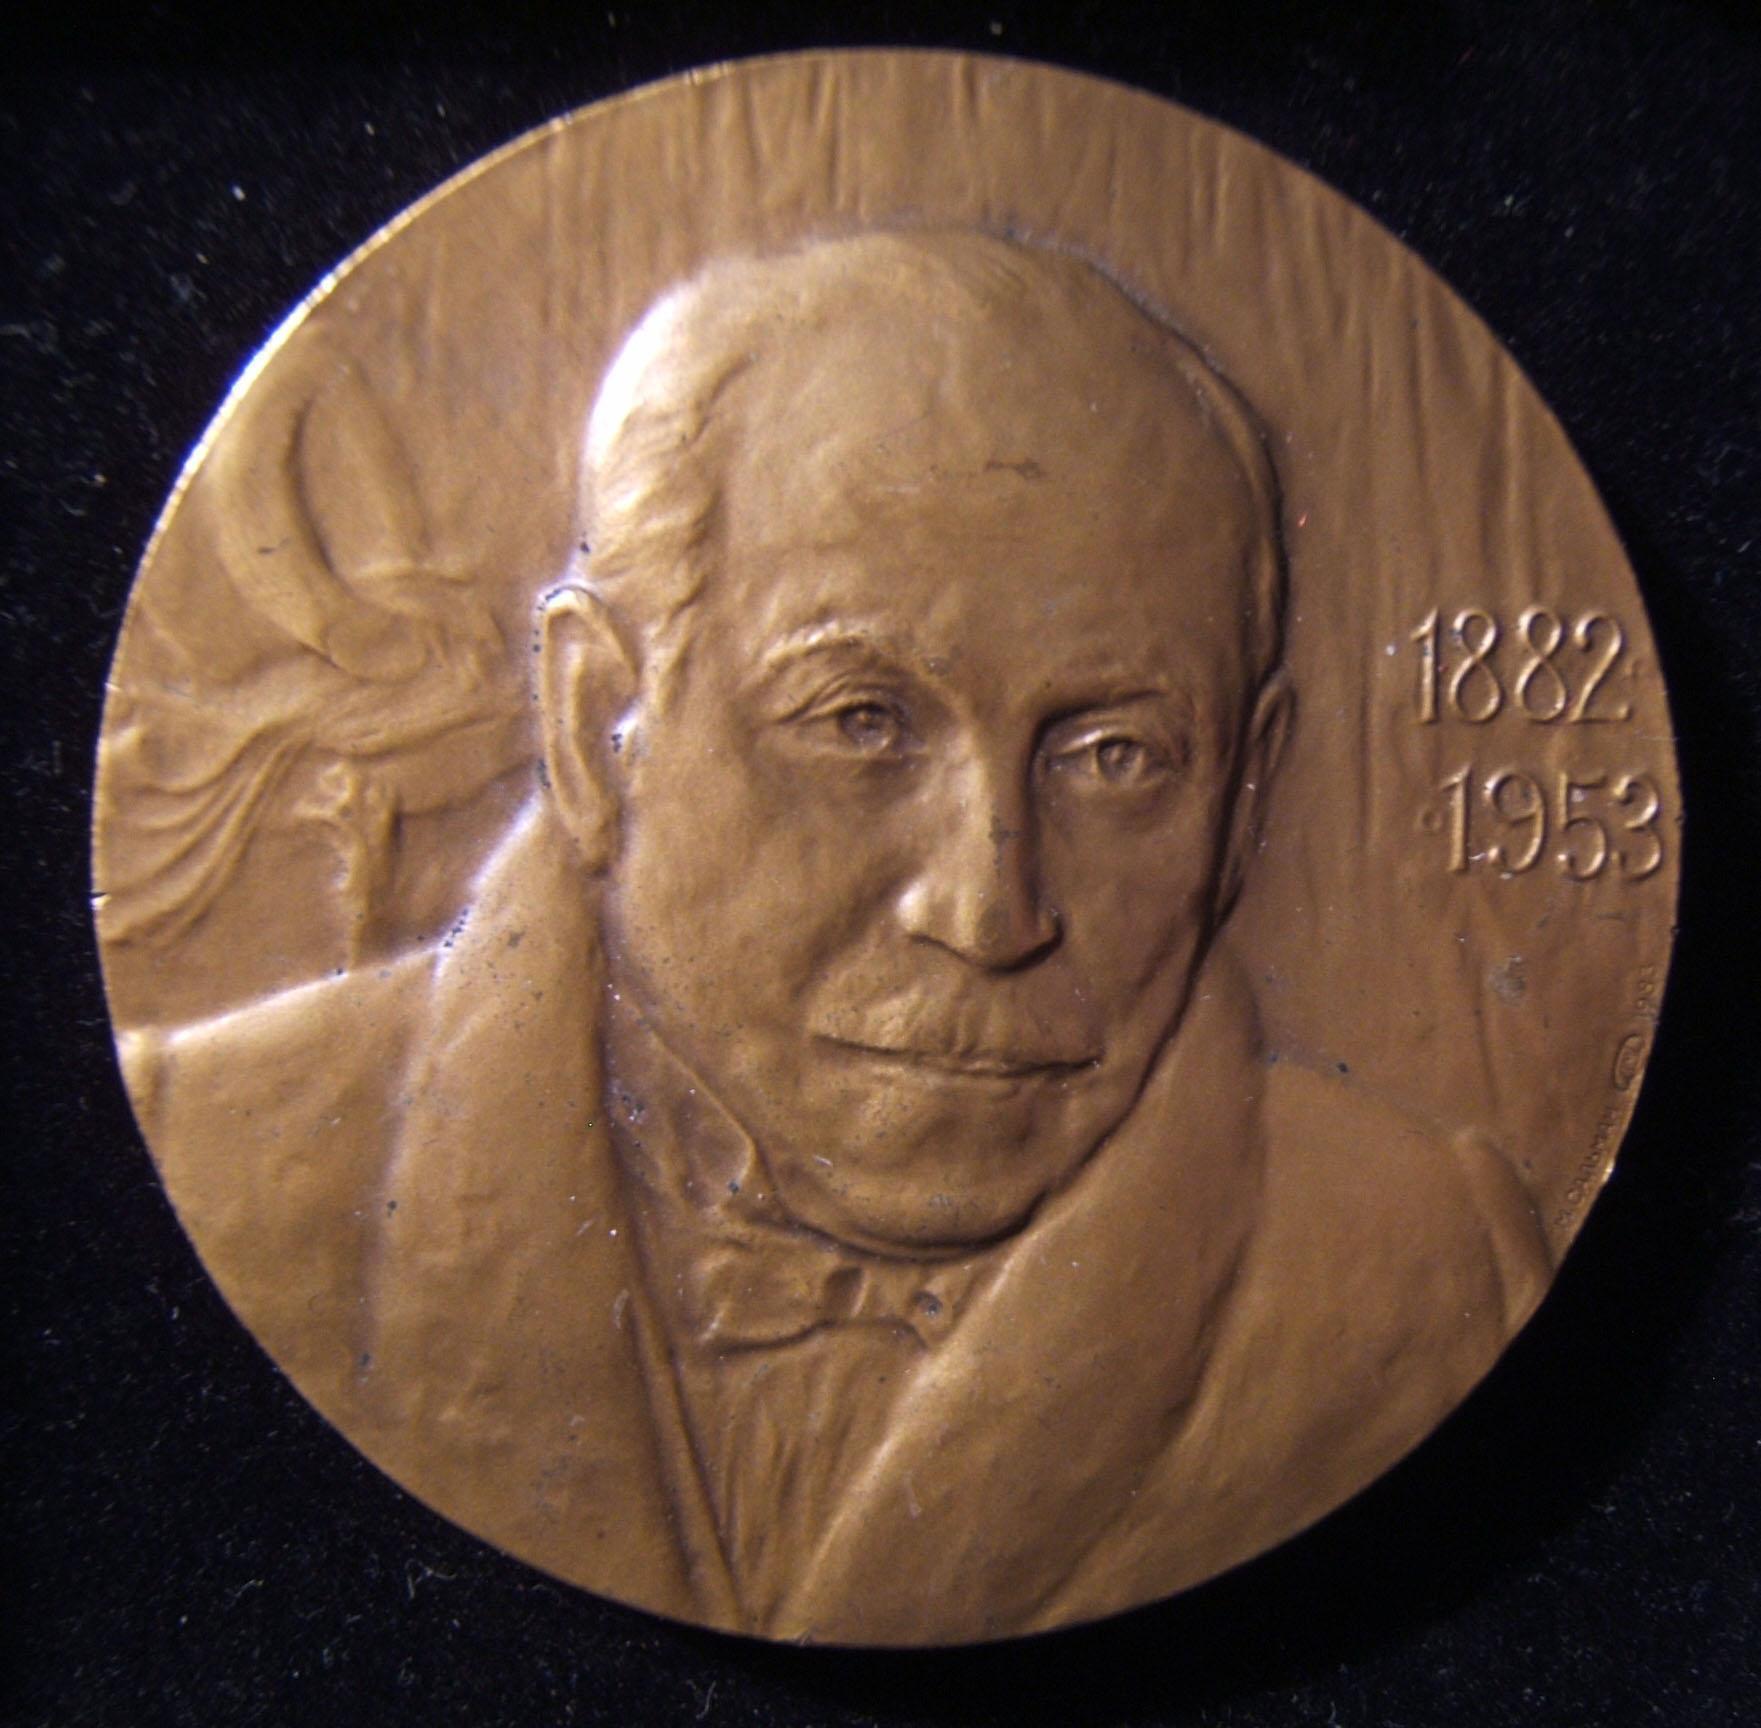 Soviet Russian Emmerich Kalman Judaica medal by Jewish medalist Mark Salman 1983